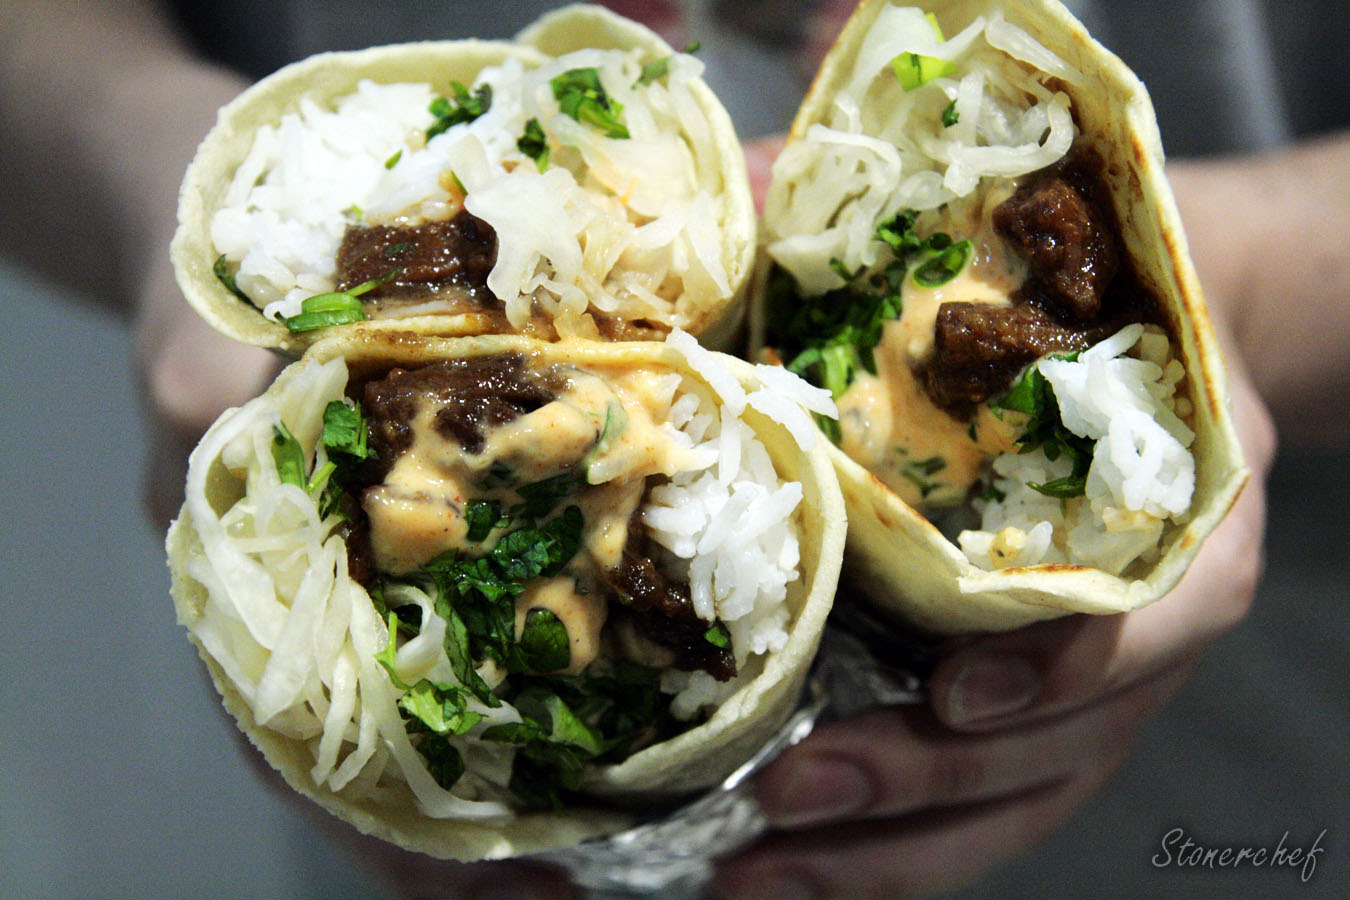 https://www.stonerchef.pl/wp-content/uploads/2017/01/zblizenie-na-dwa-koreanskie-burrito.jpg